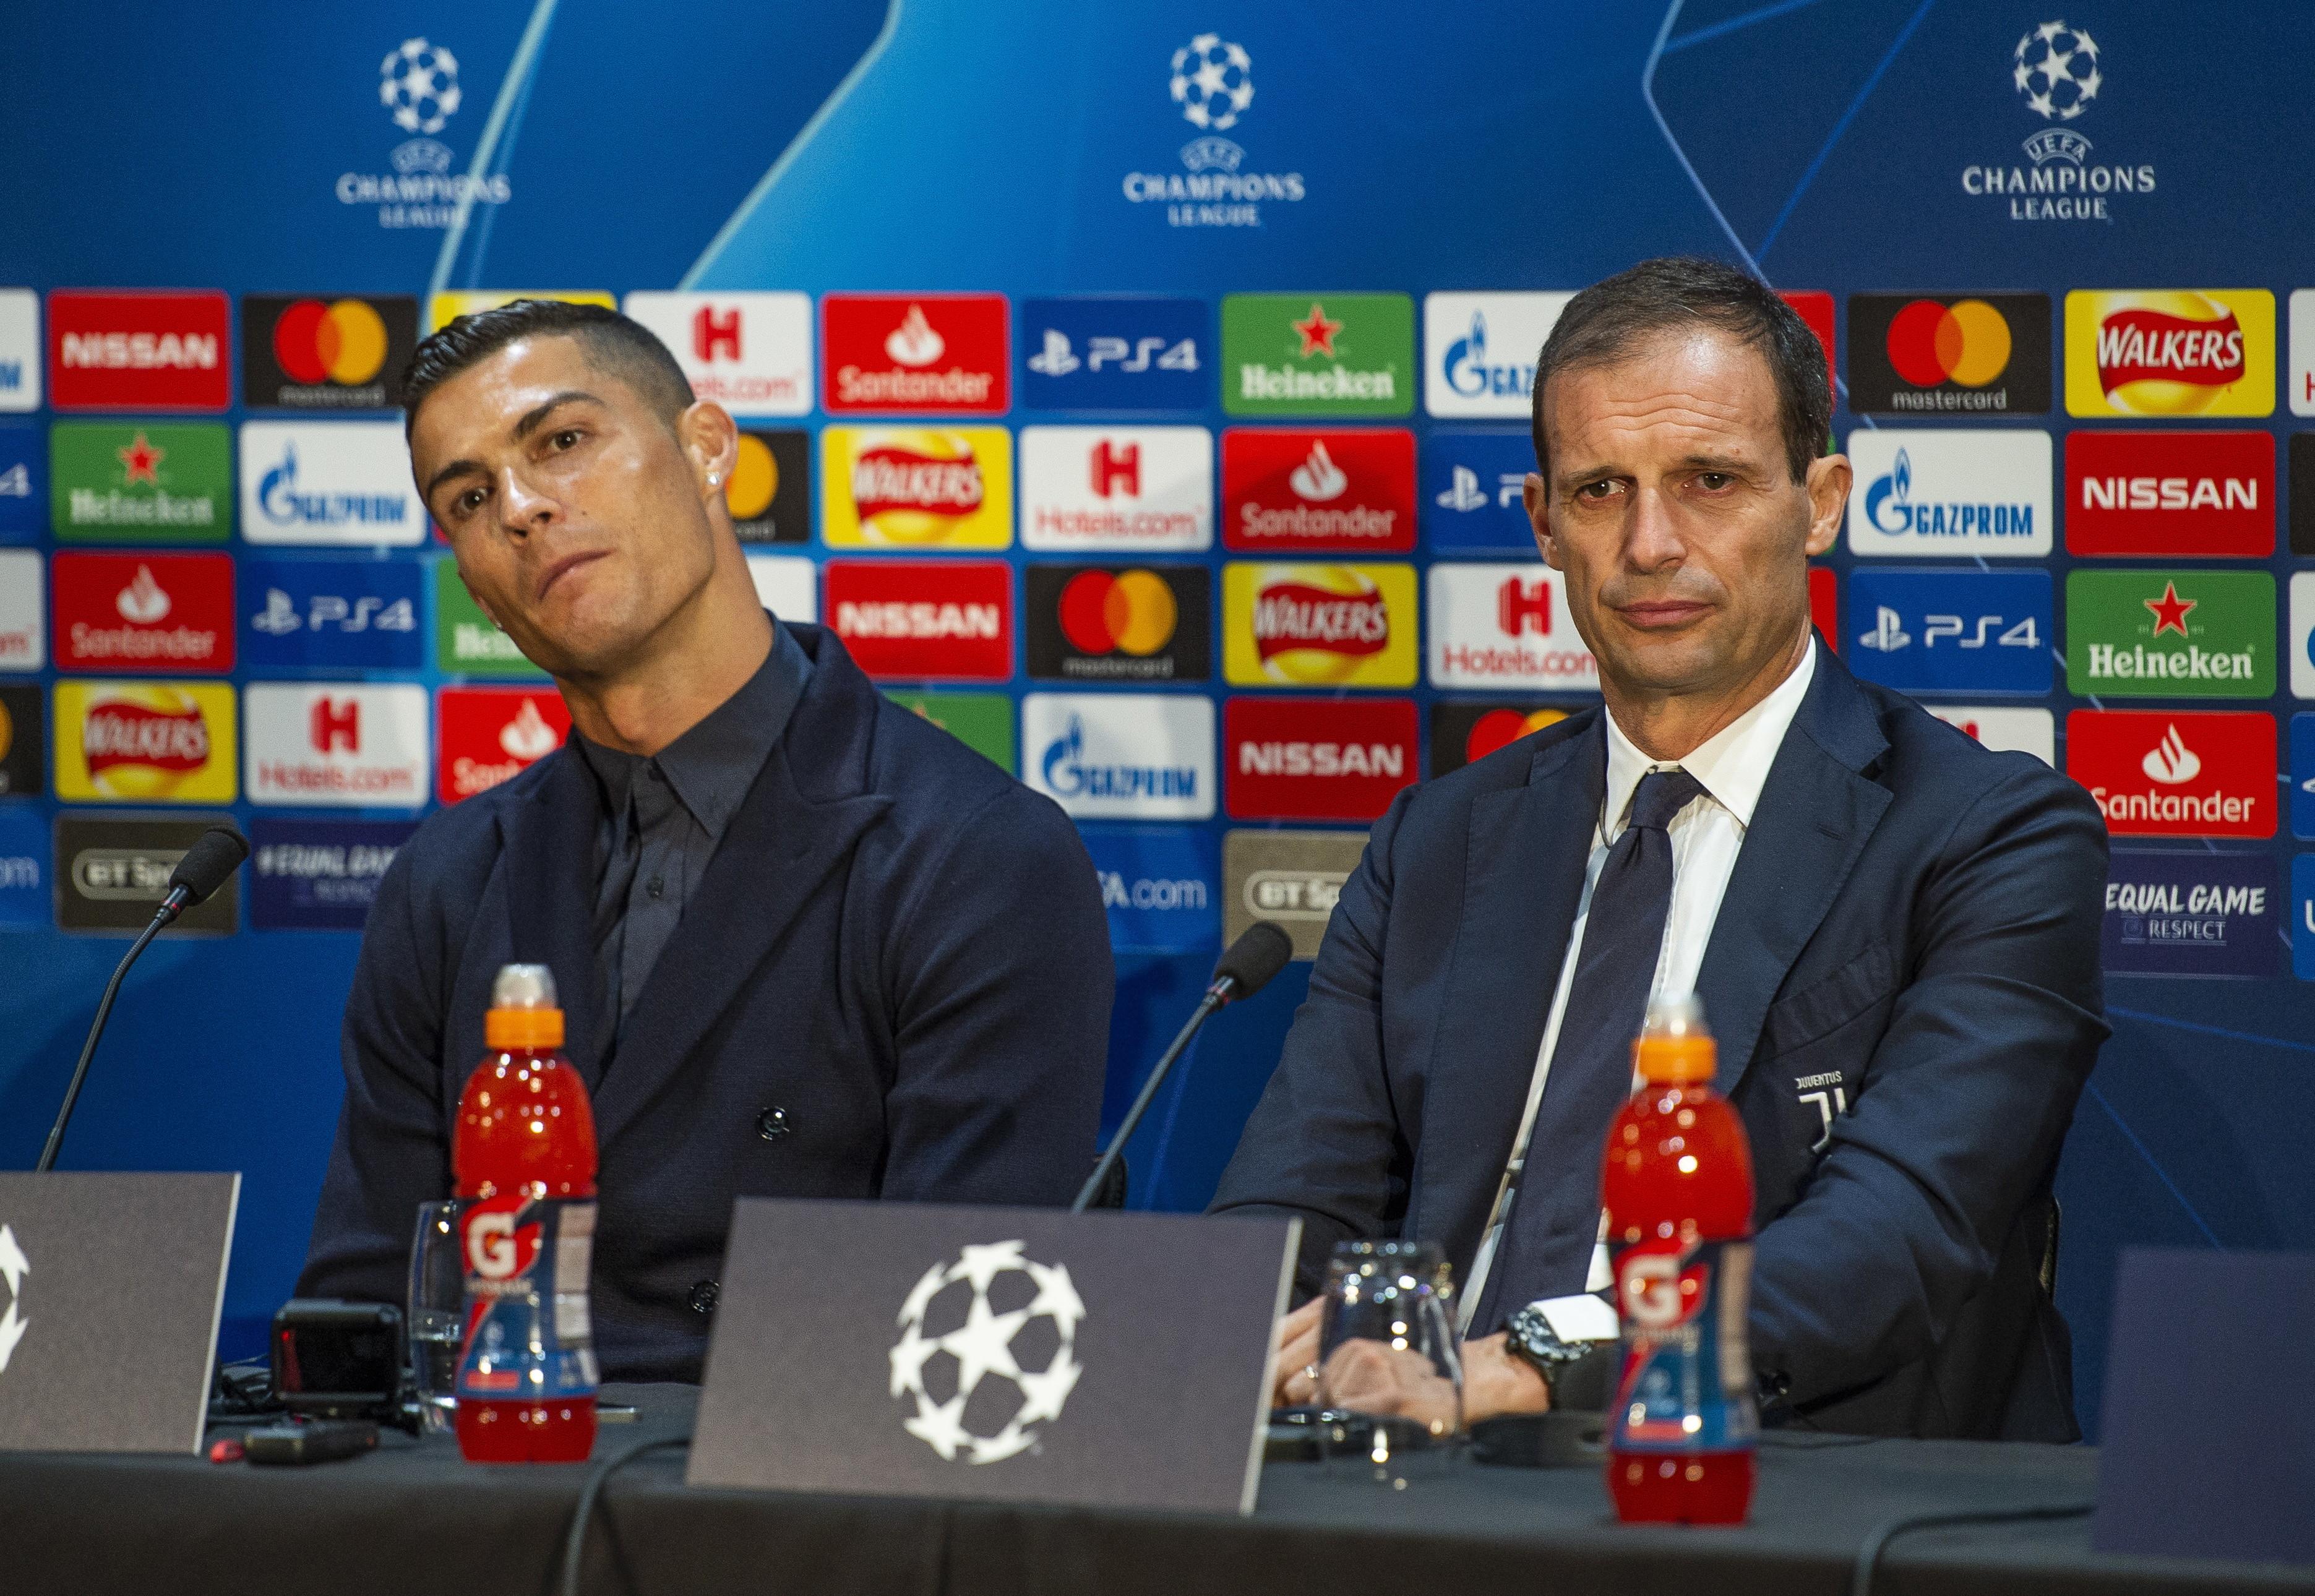 Cum arata ceasul de 2 milioane de euro purtat de Cristiano Ronaldo la o conferinta de presa